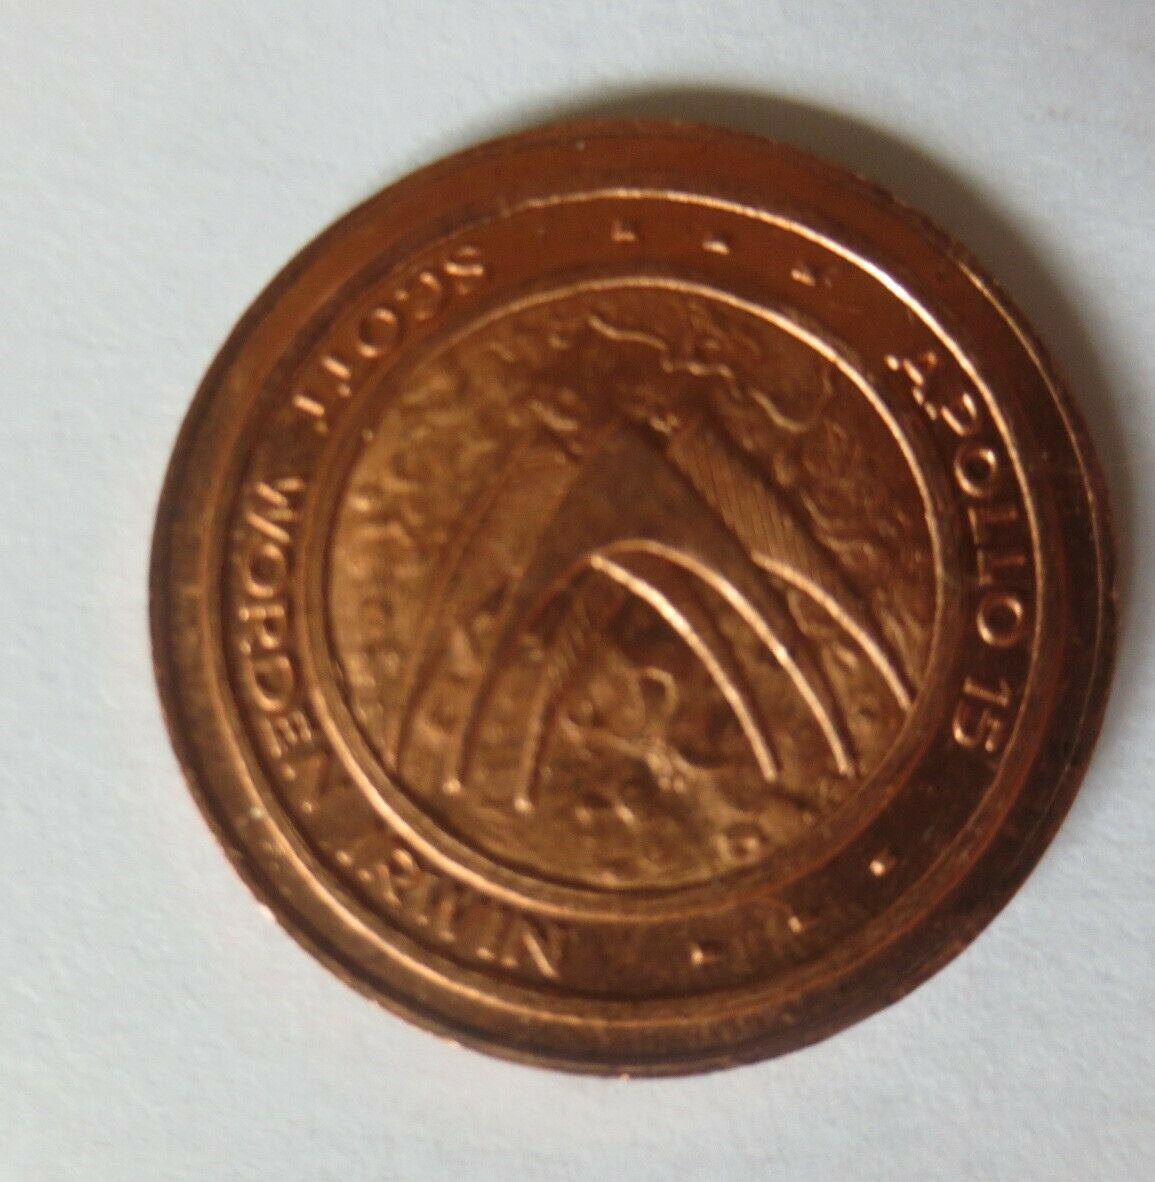 Medaille 1971 Deutschland Apollo 15 - Raumfahrt - Scott - Worden - Irwin♥(54253) 1